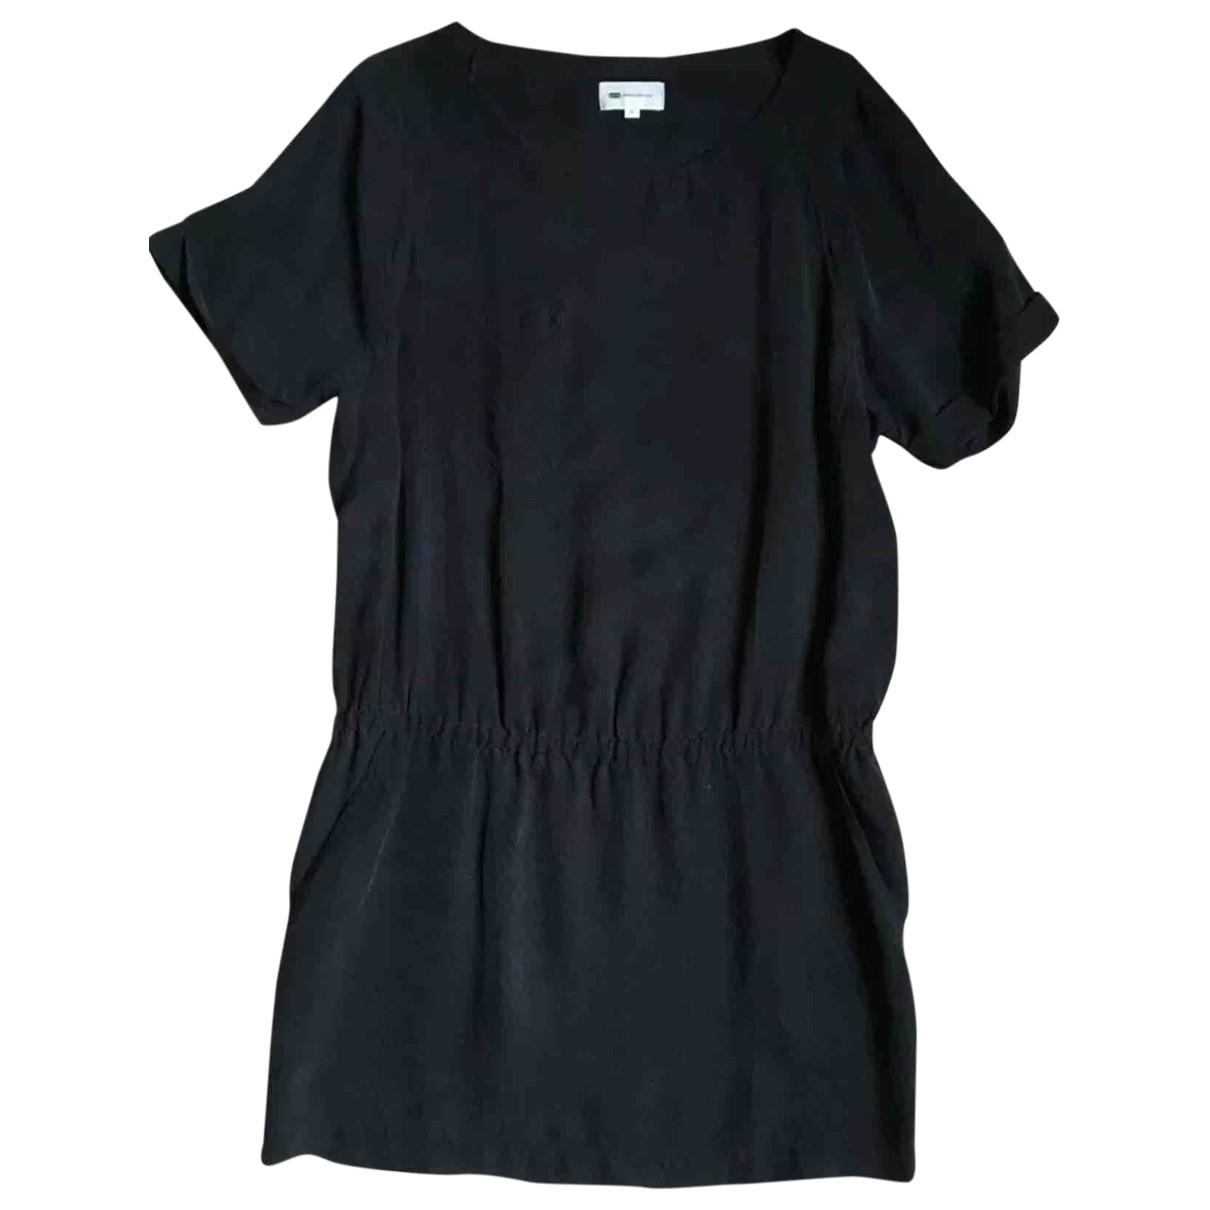 Vanessa Bruno Athe \N Black dress for Women 36 FR